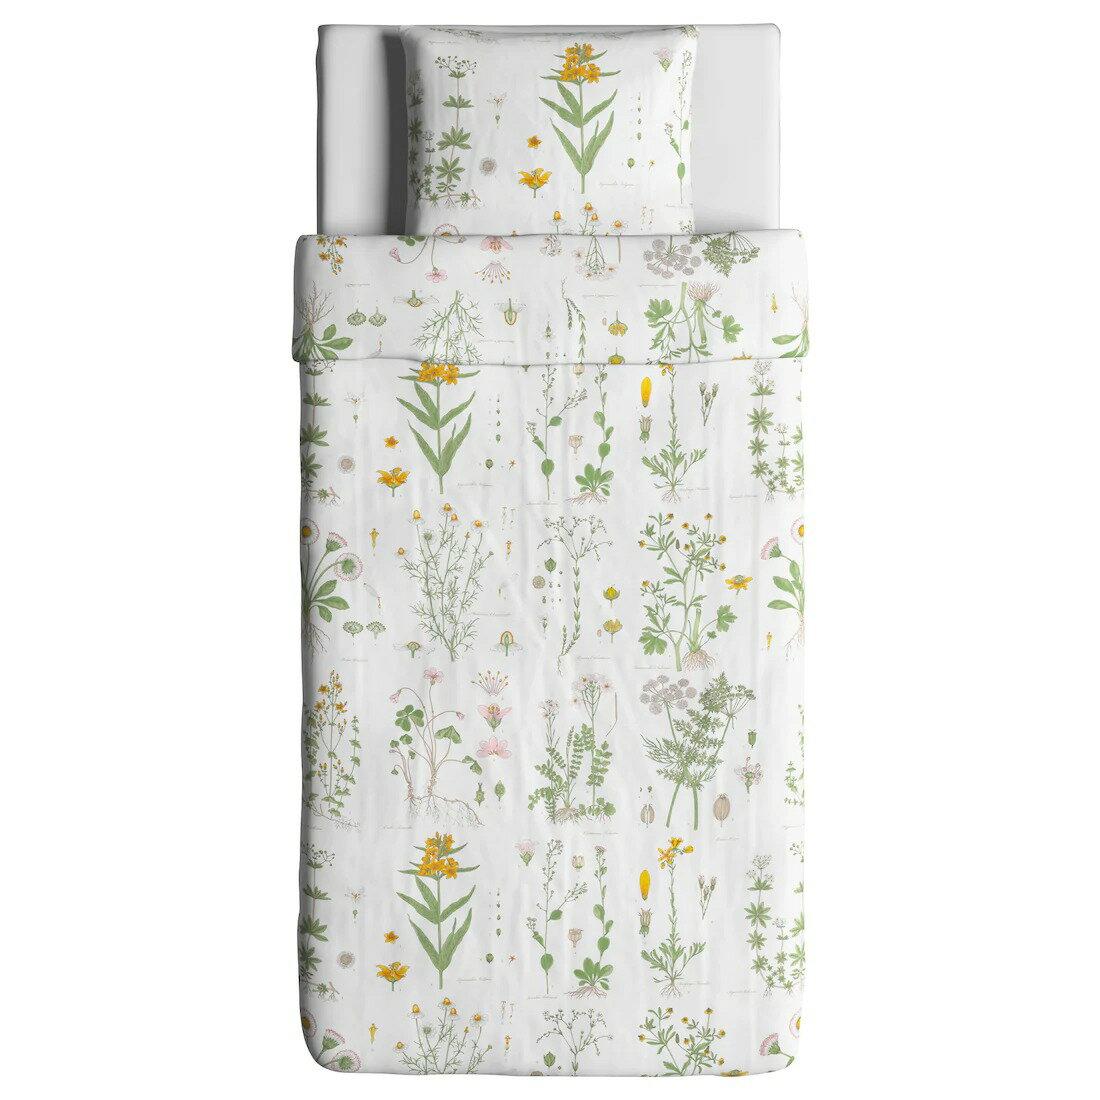 【IKEA Original】STRANDKRYPA 掛け布団カバー&枕カバー シングルサイズ用 フローラルパターン/ホワイト 150x200/50x60cm